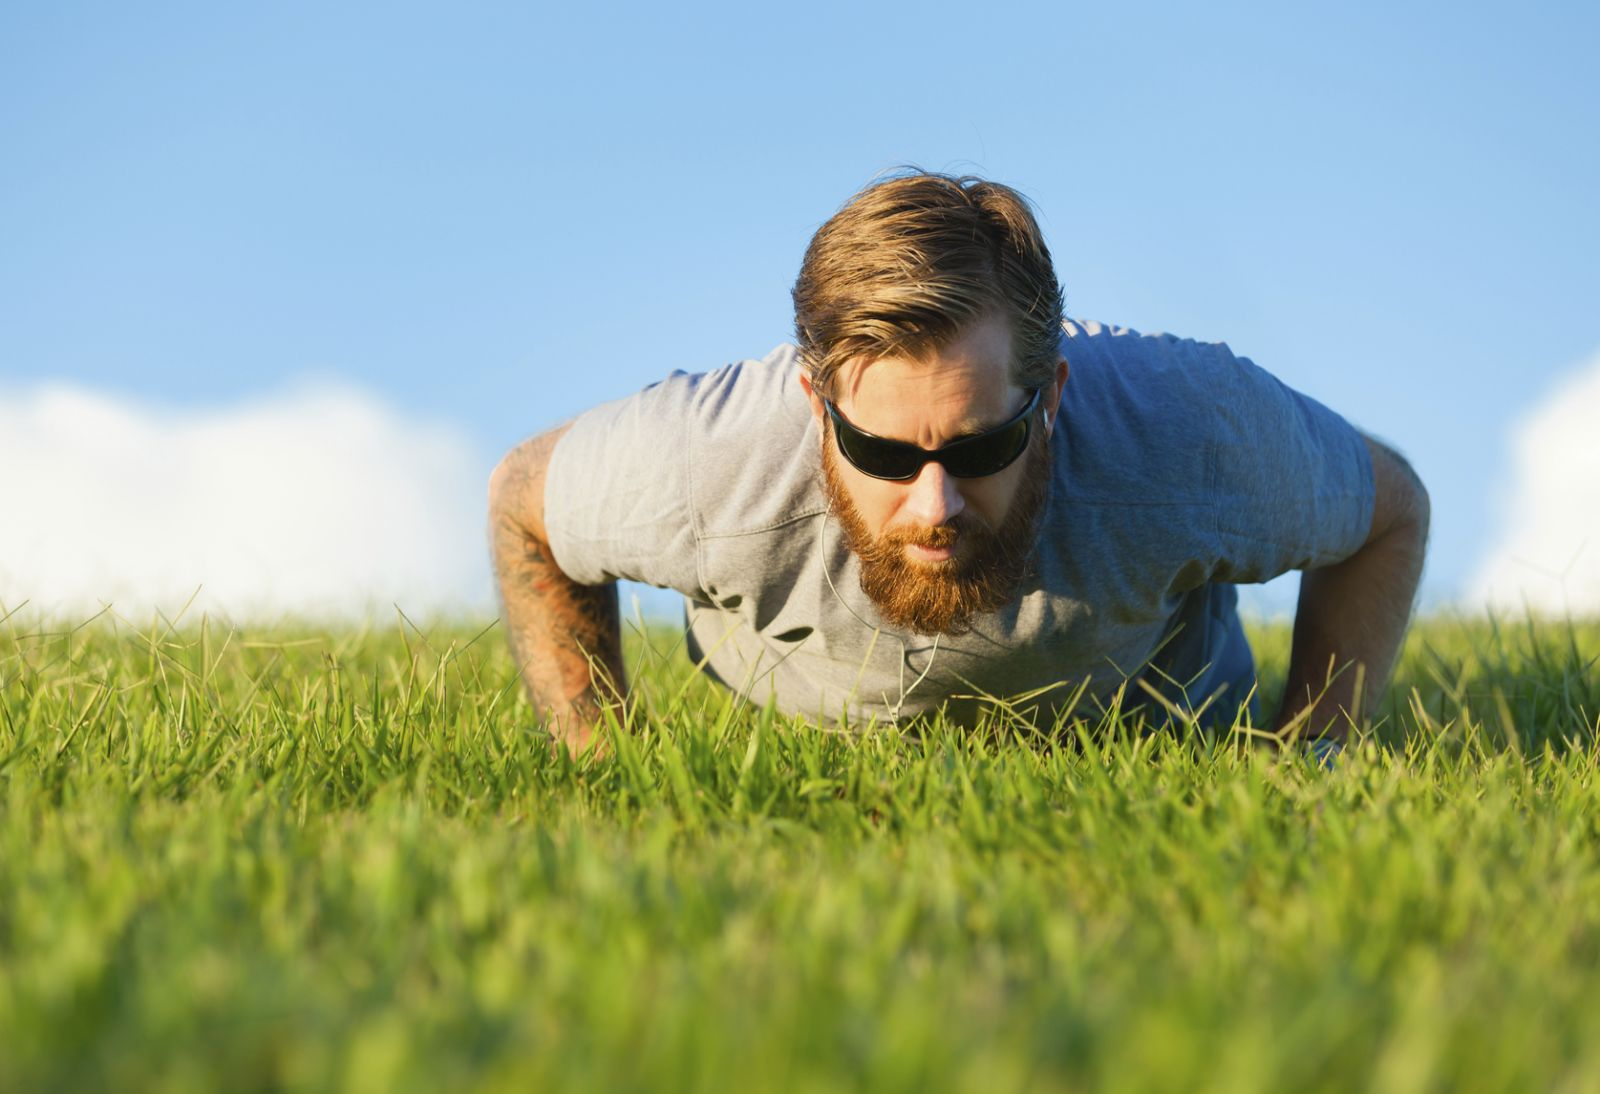 push-ups help beat aging